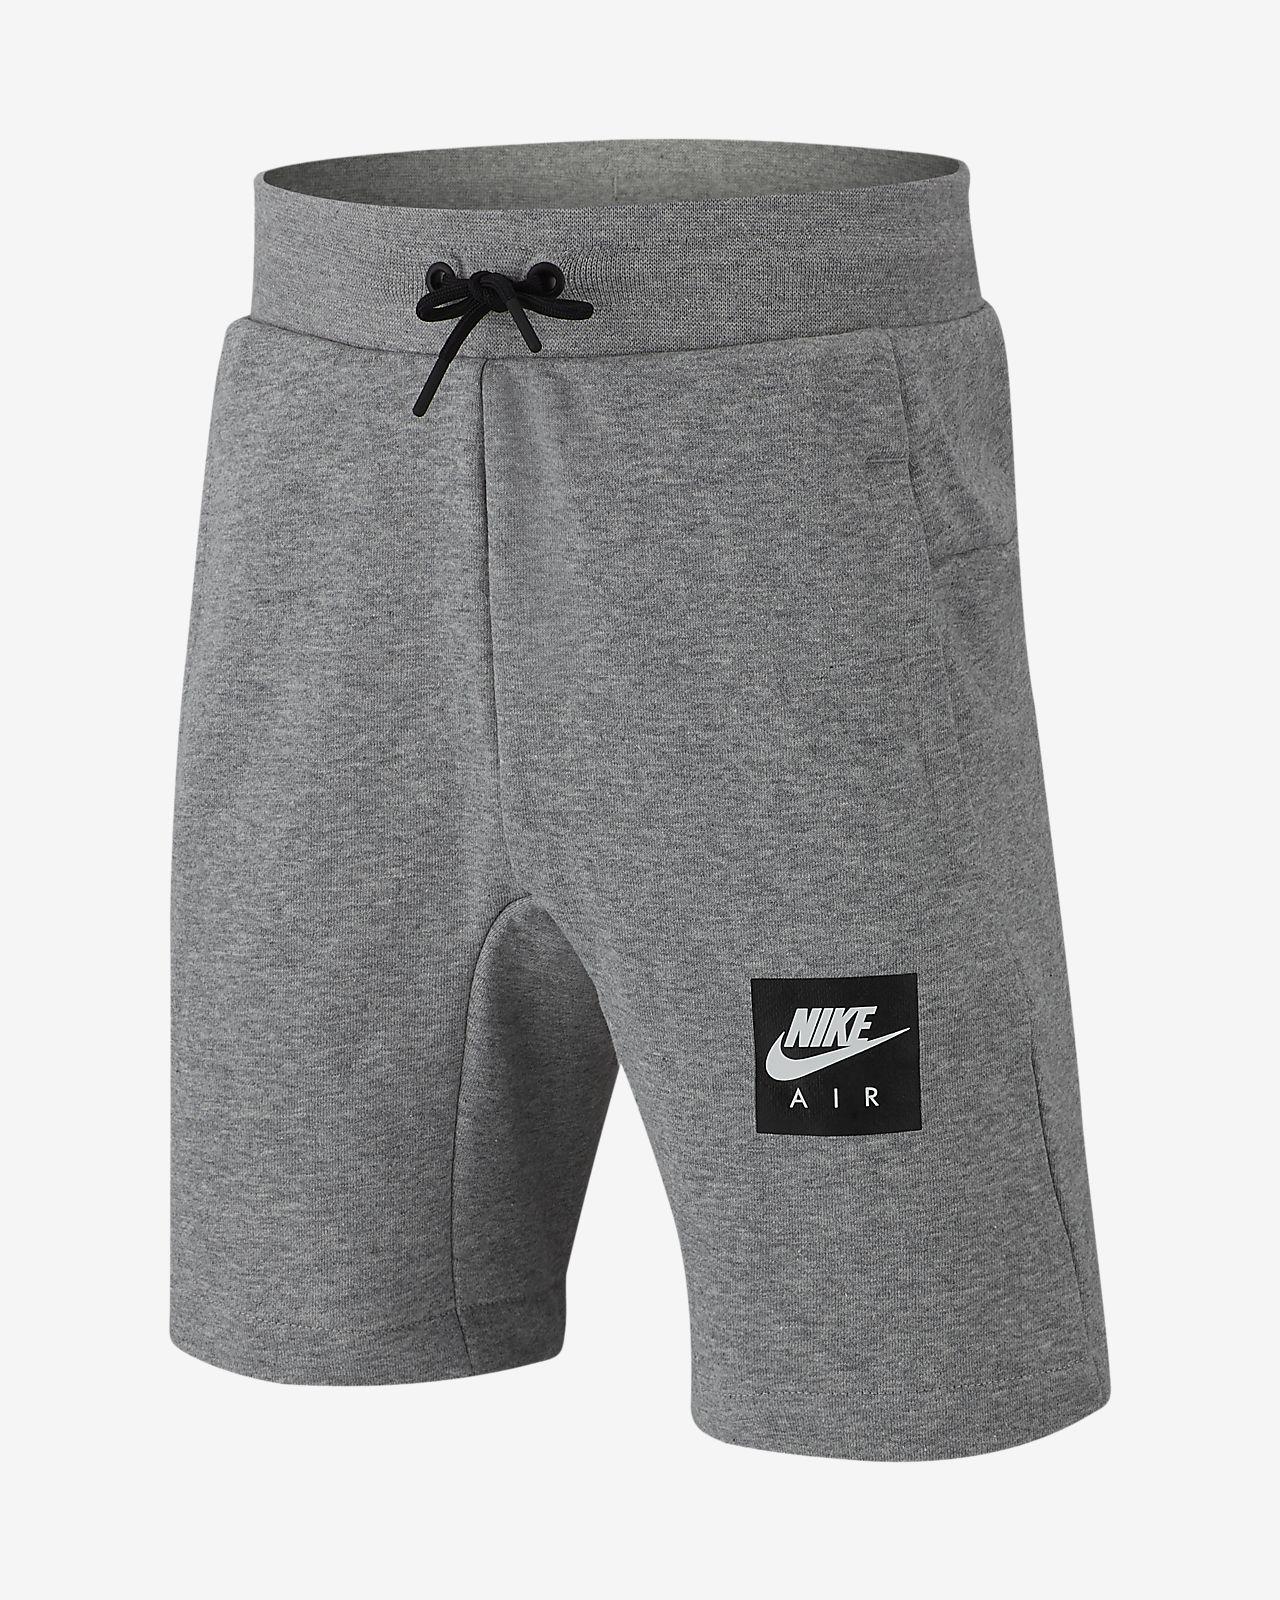 b0df77480a9 Nike Air Older Kids  (Boys ) Shorts. Nike.com LU